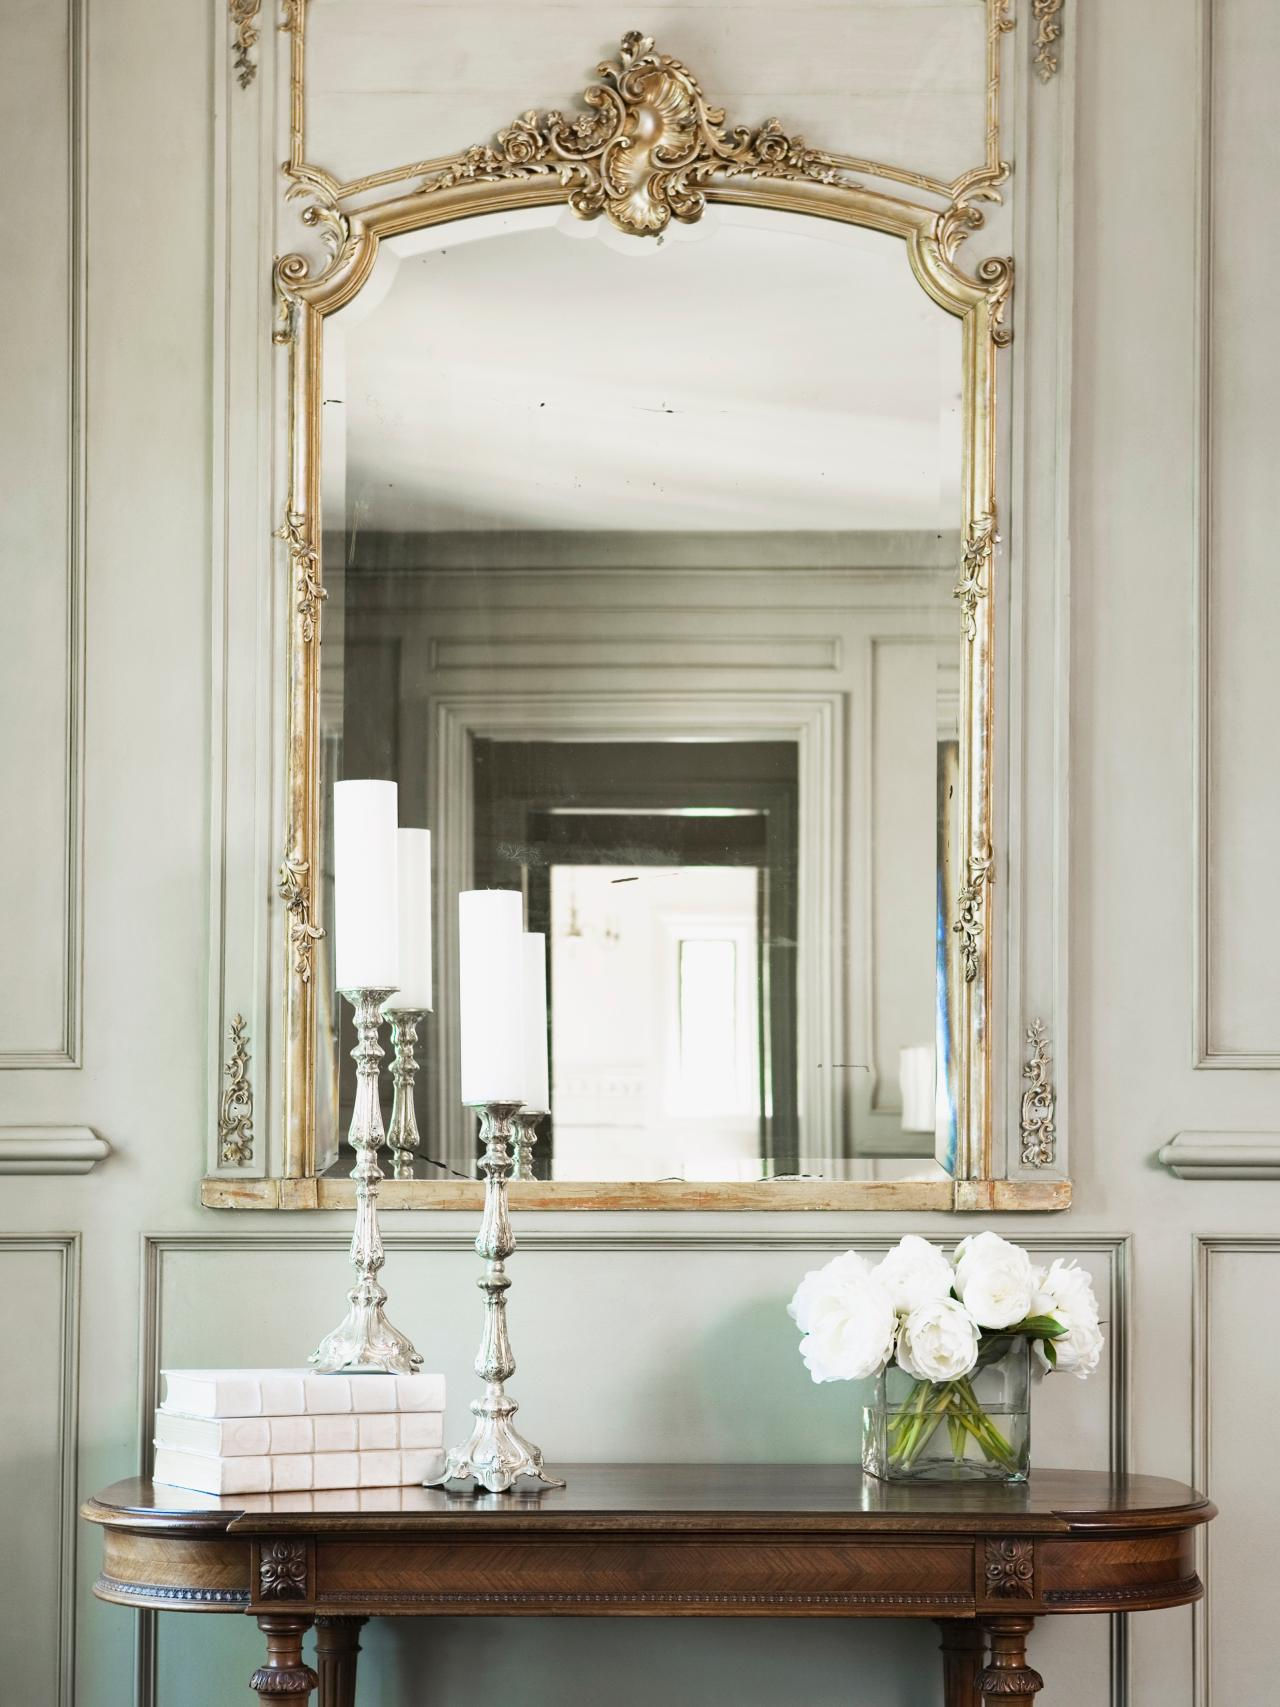 photos-hgtv-antique-table-and-gilt-mirror-in-neutral-hallway_decorative-hallway-mirrors_home-decor_home-decorators-coupon-code-decor-stores-yosemite-bohemian-western-christian-target-sincere-office- de